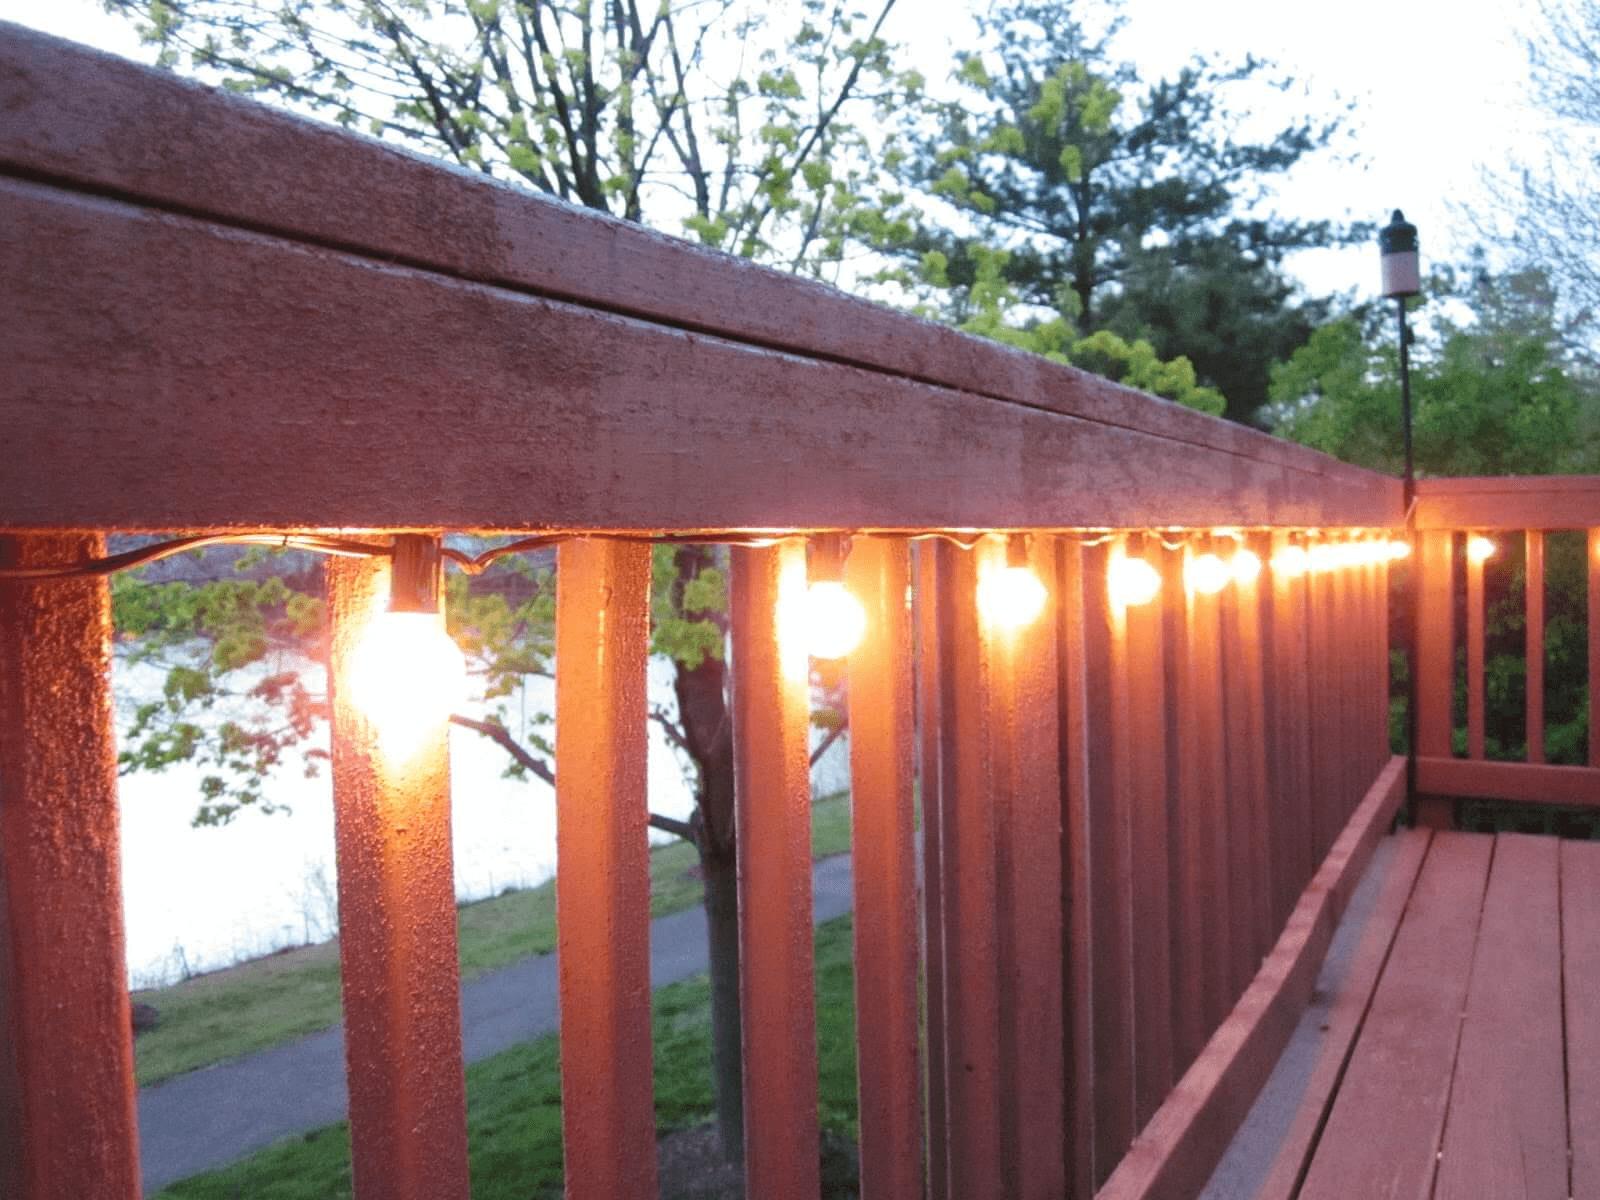 RAILING PORCH LIGHTING DESIGN IDEAS